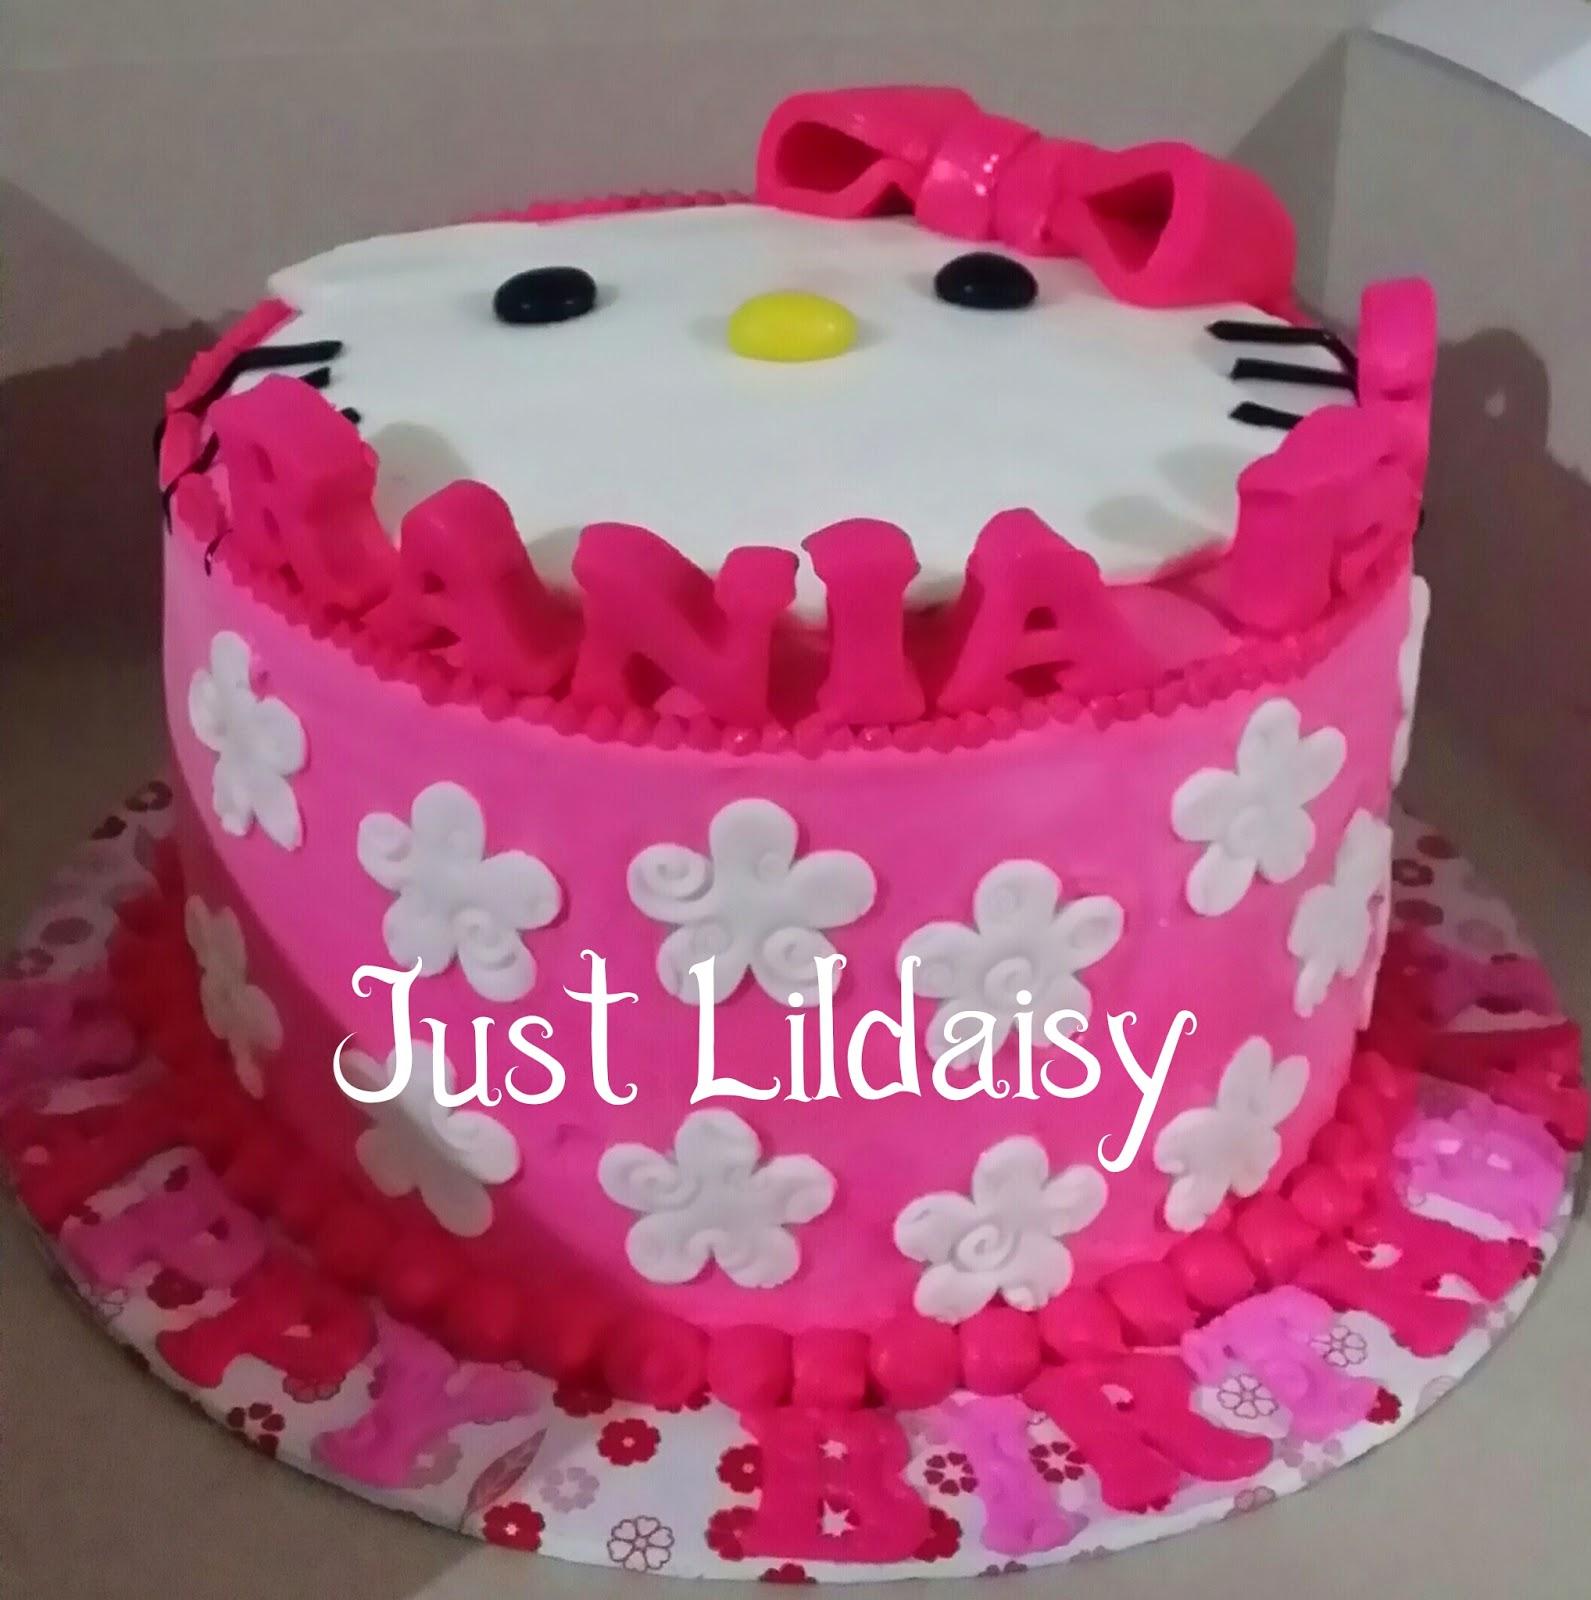 Just Lildaisy Ampang Hello kitty birthday cake and doorgift